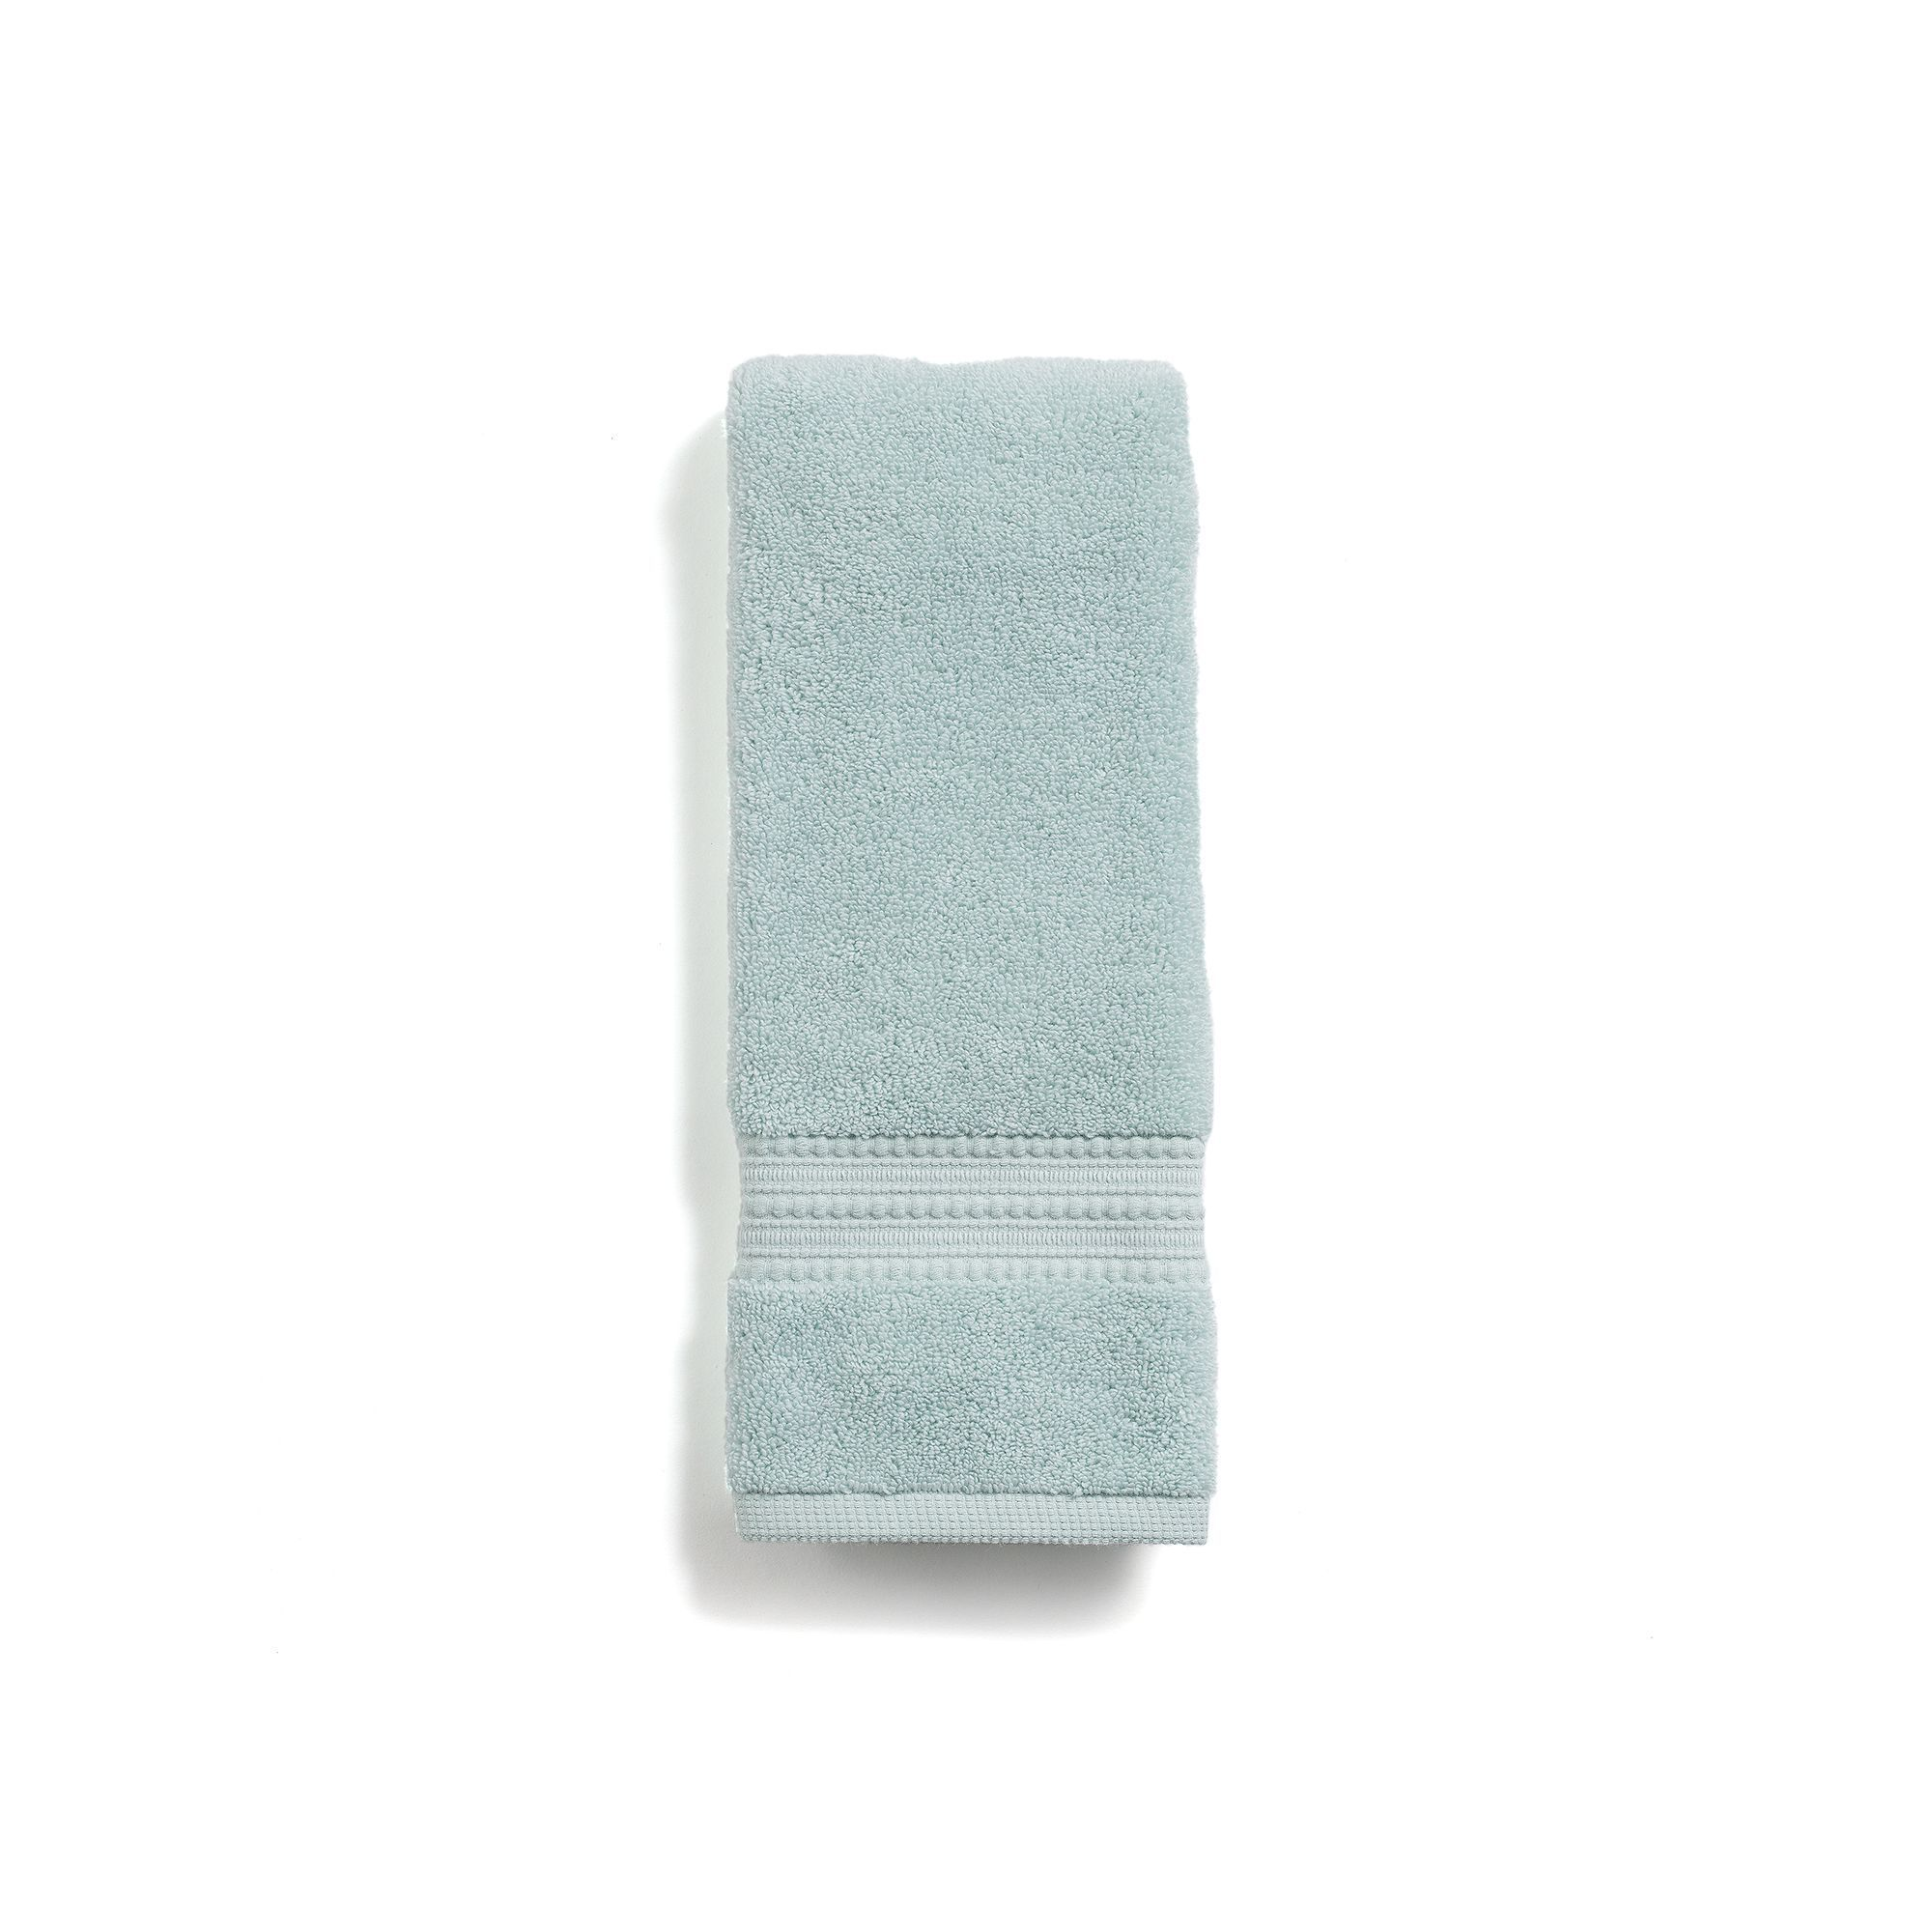 Lauren Conrad Pima Cotton Hand Towel | LC Lauren Conrad, Hand towels ...